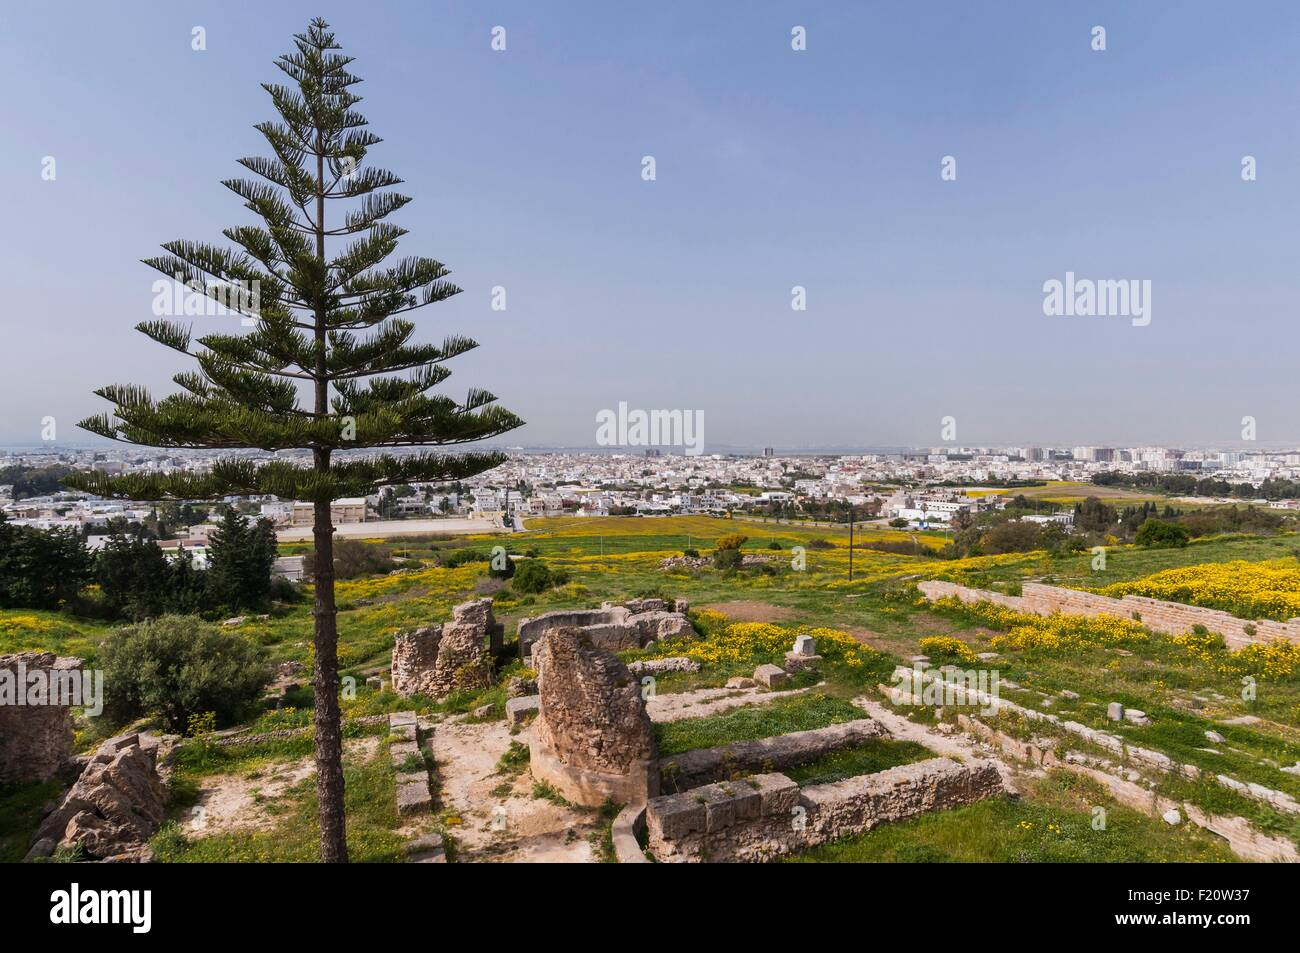 Tunisia, Gorvenorate of Tunis, Carthage, archeologic site of Punic city, listed as World Heritage by UNESCO - Stock Image